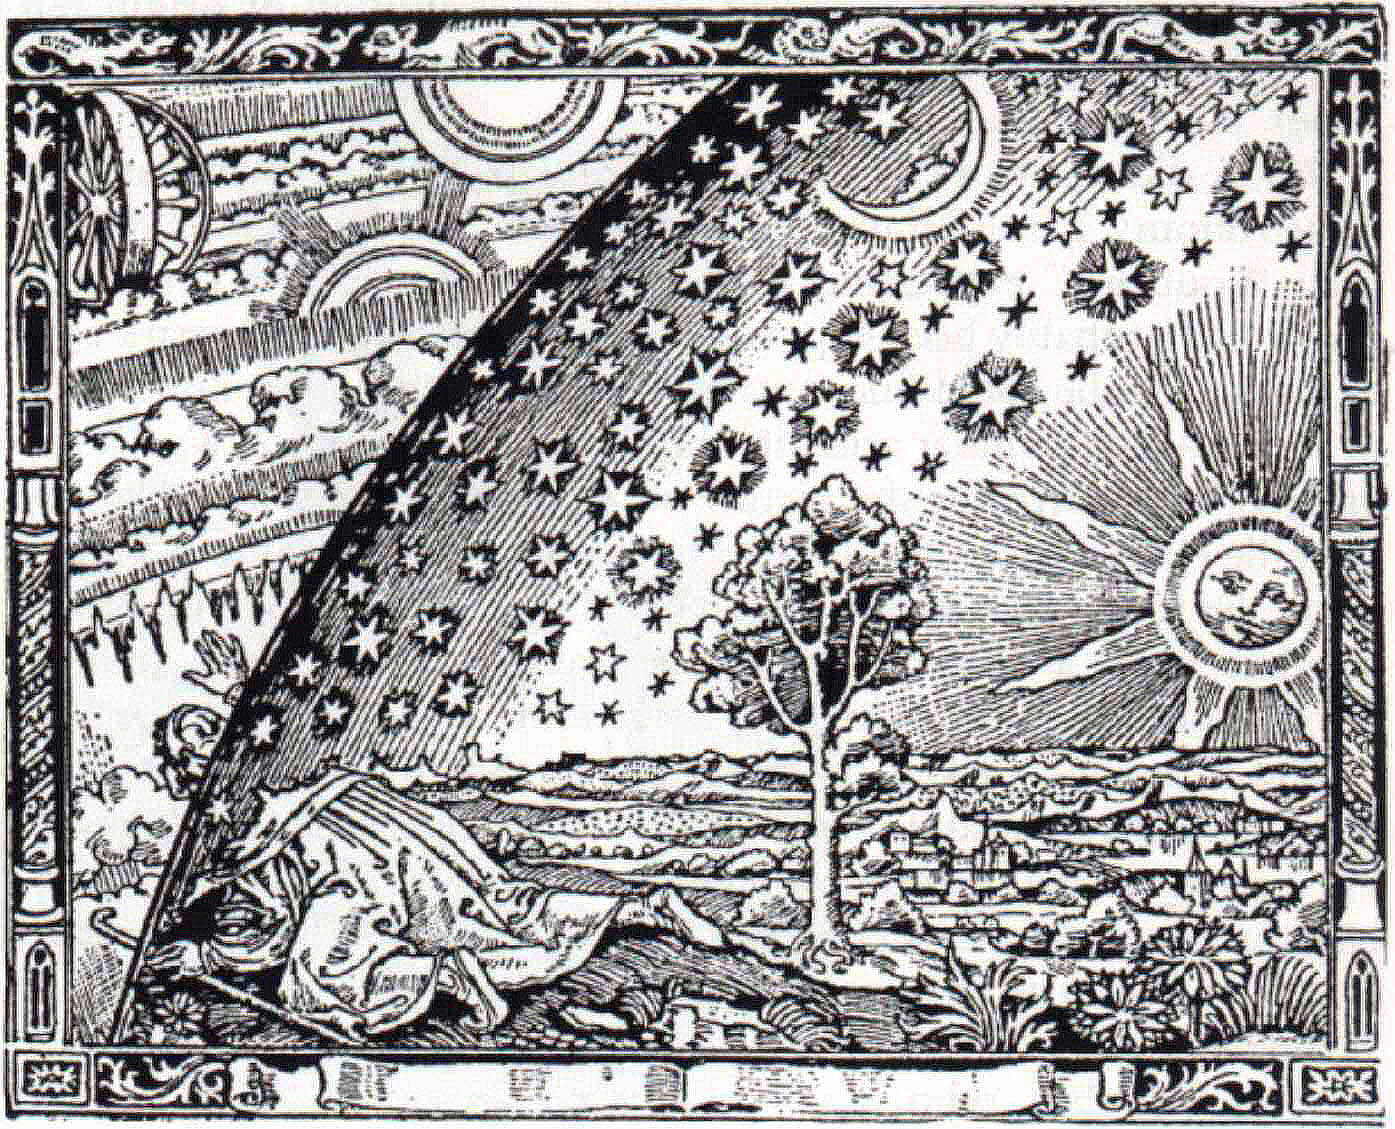 Datei Camille Flammarion Himmelskunde Die Atmosphaere 1